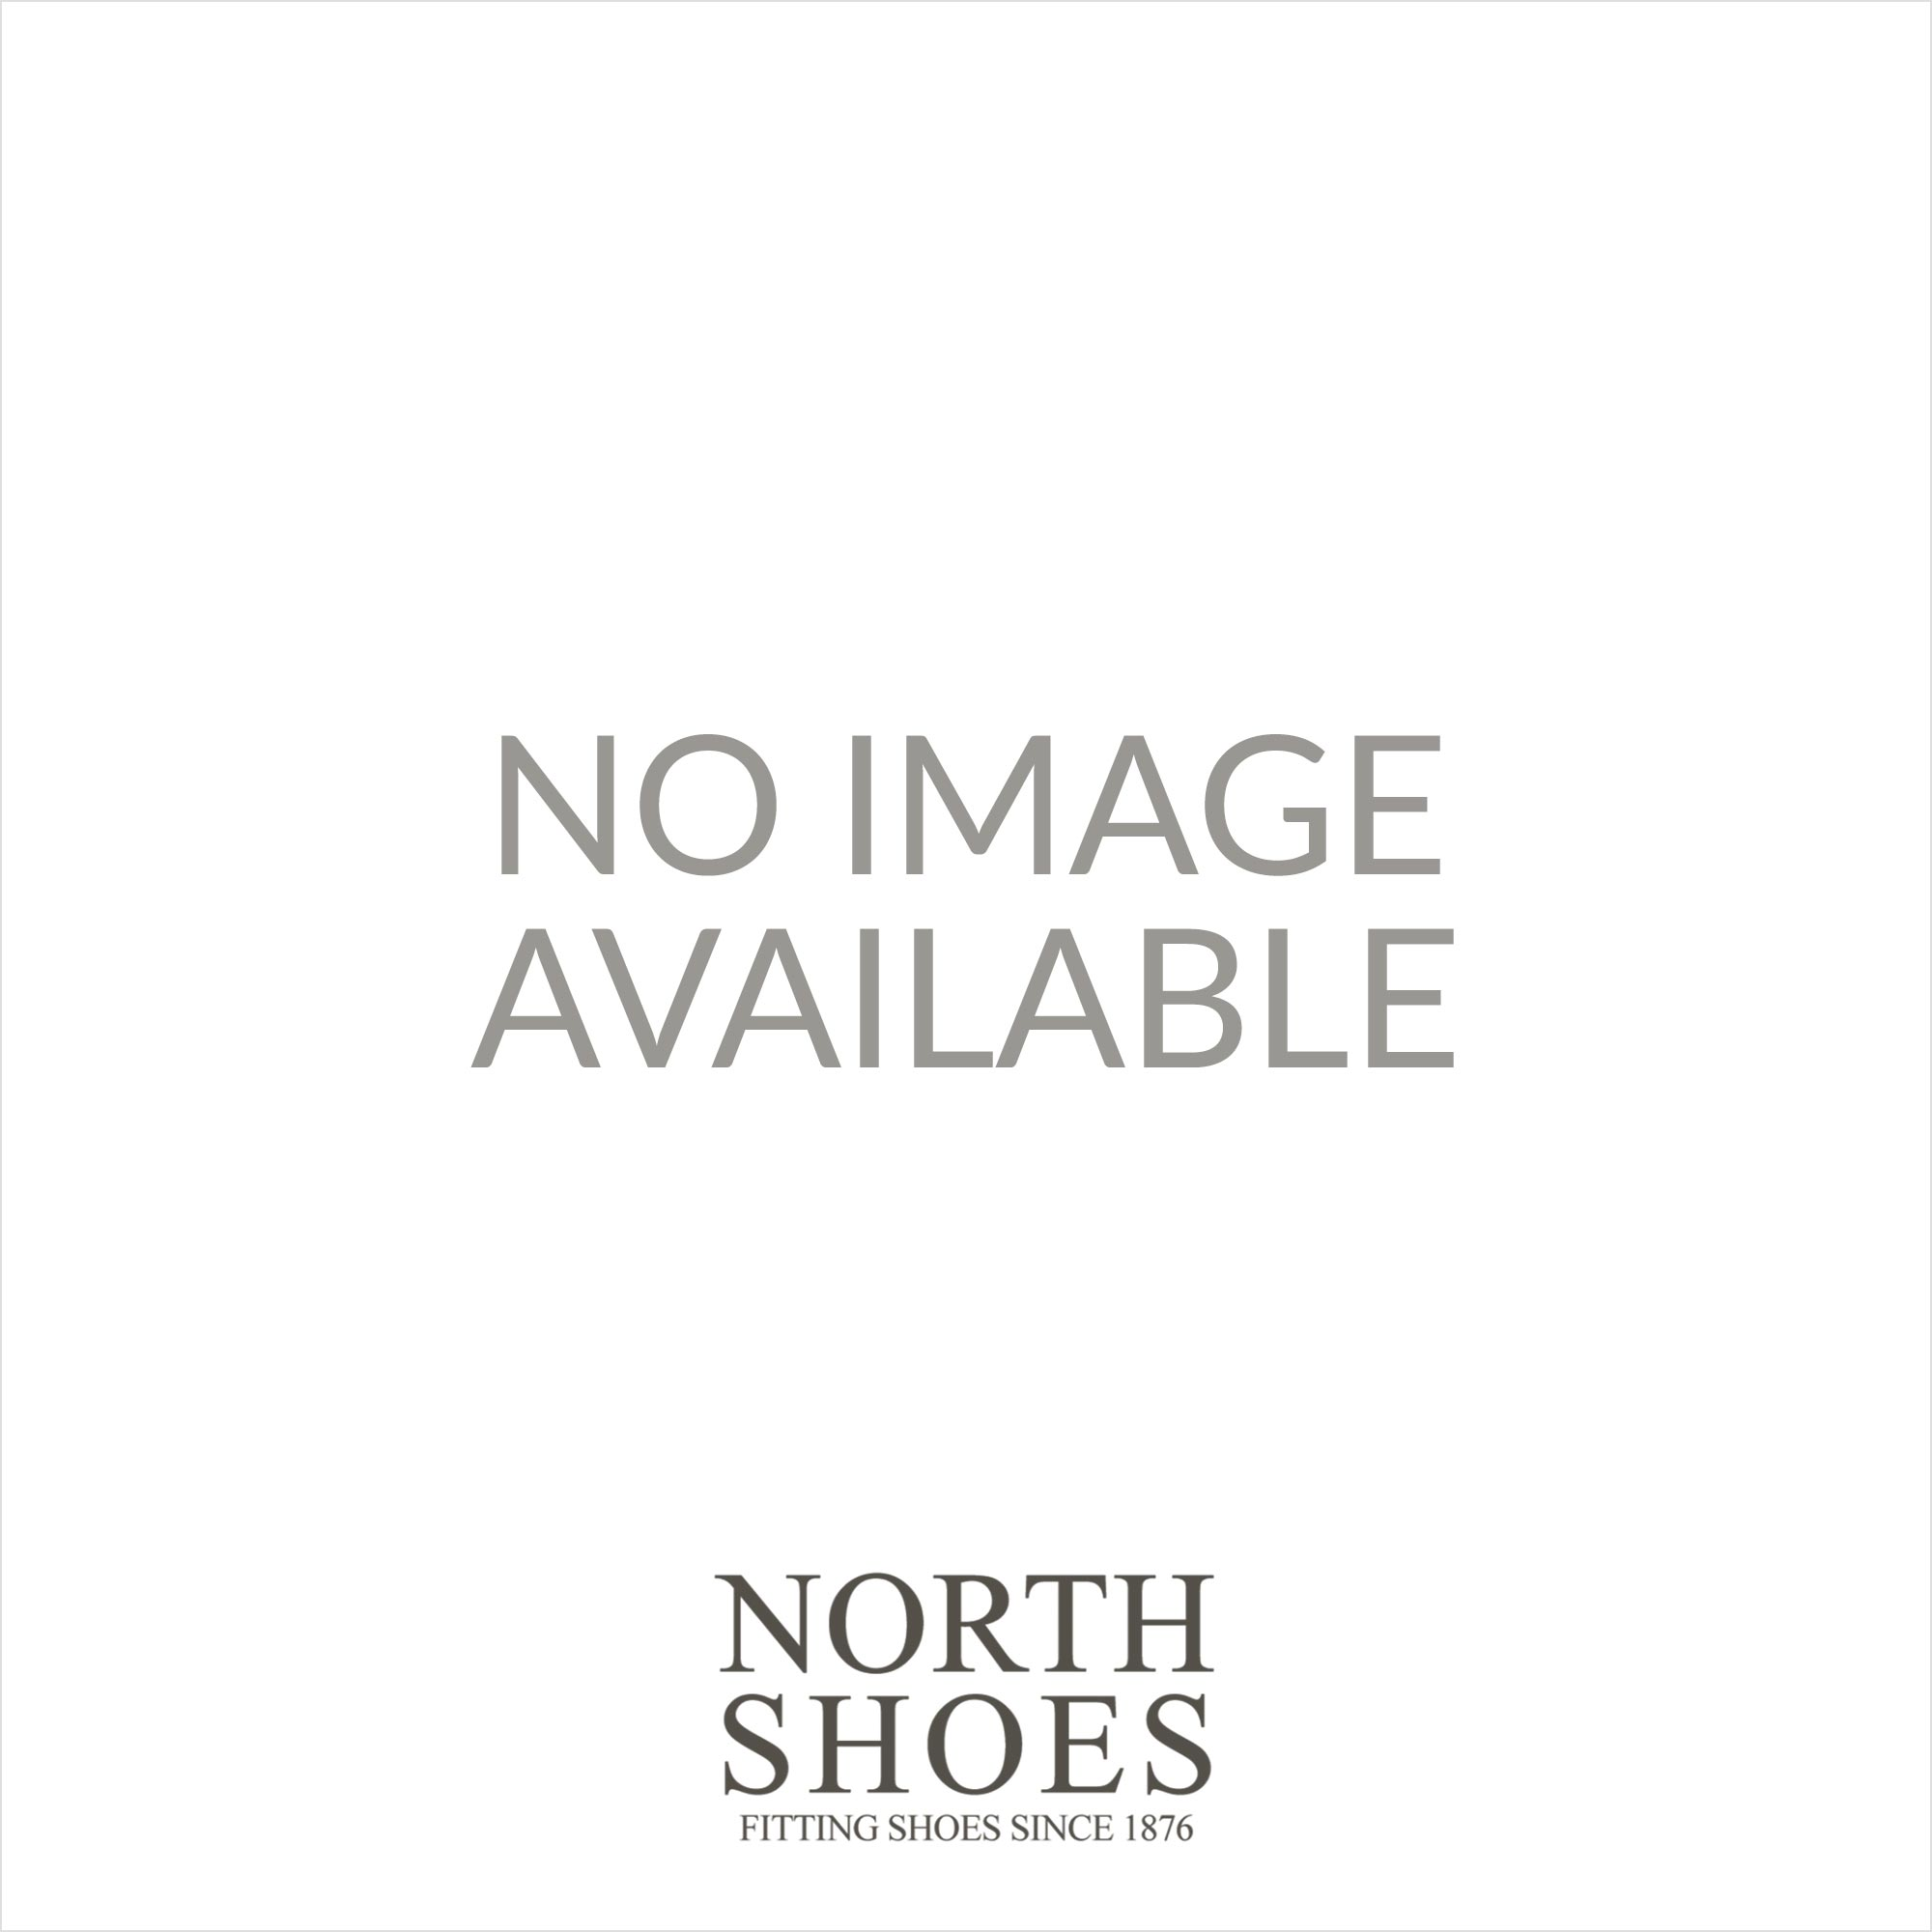 a6919e791dec1 ... Gabor 93.100-36 Navy Suede/Patent Leather Womens Ballerina Pump Slip On  Shoe